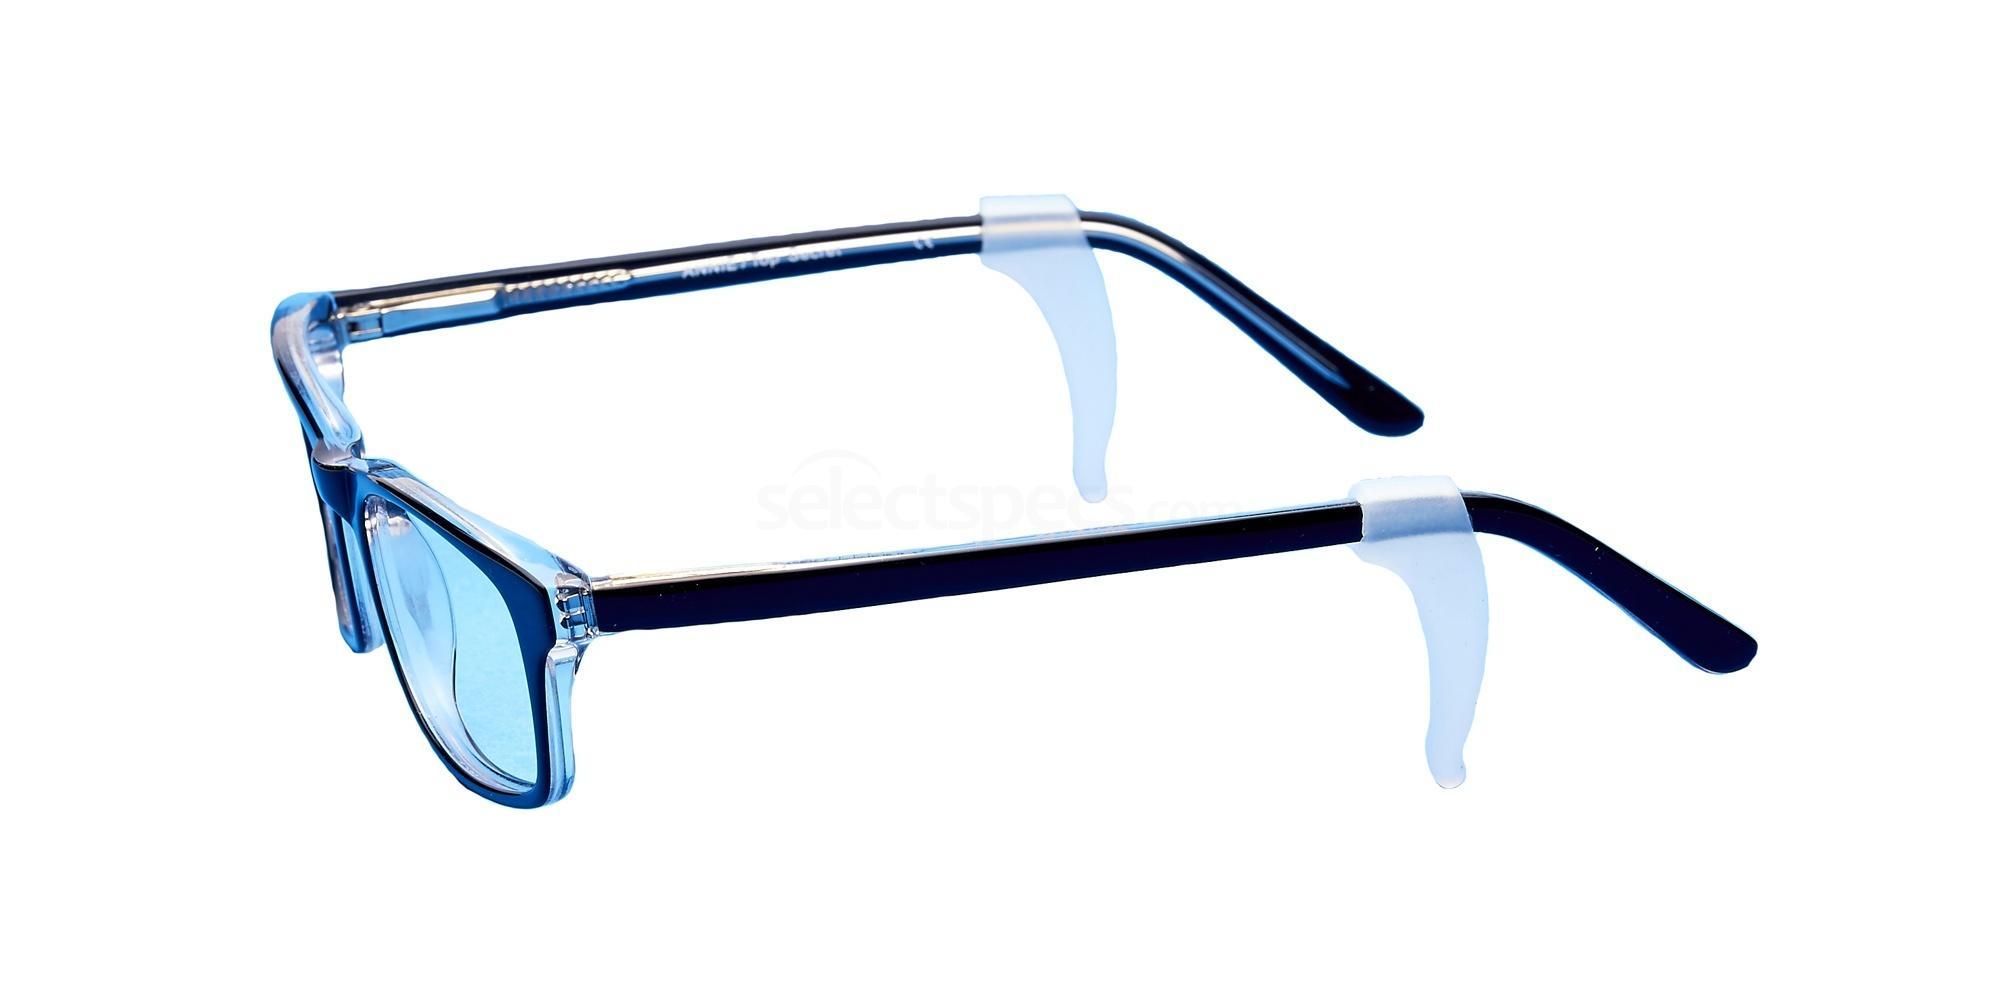 C1 EARTIPEXTENS Glasses, Top Secret KIDS